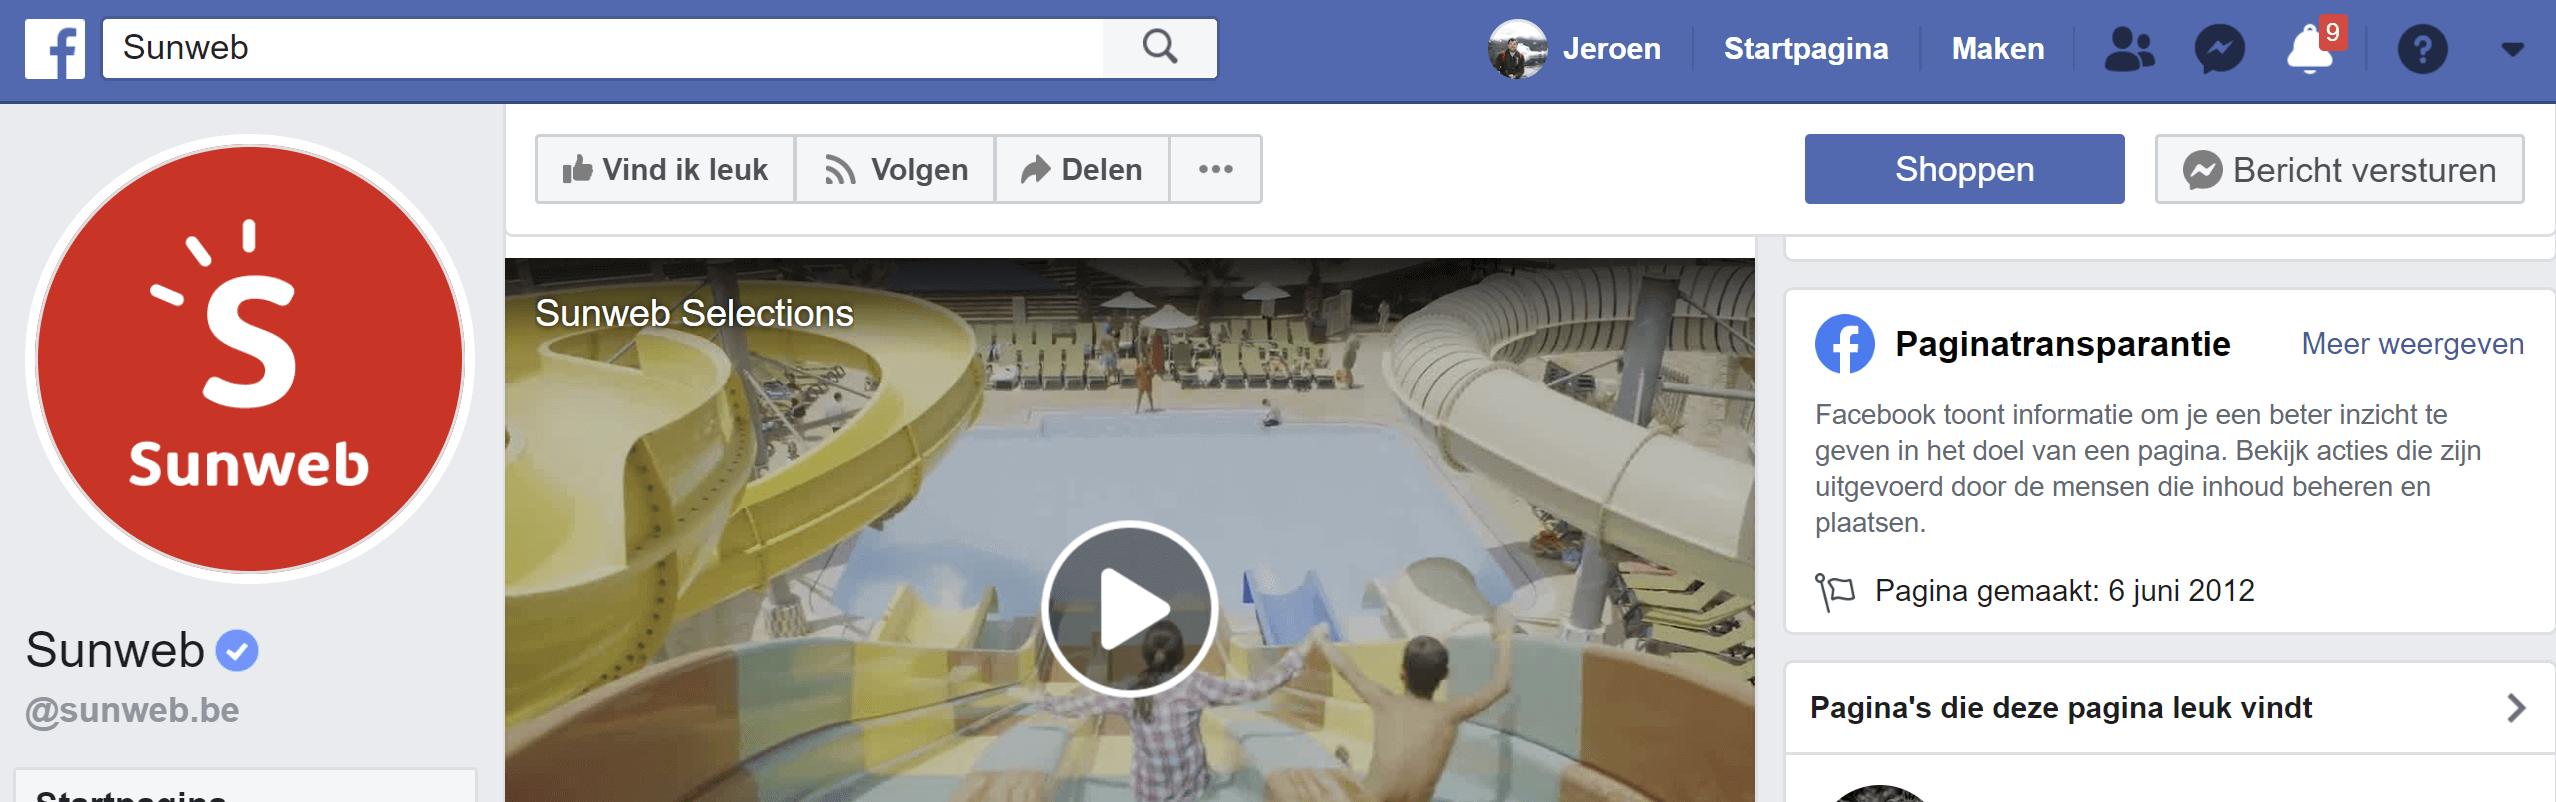 Sunweb Facebook